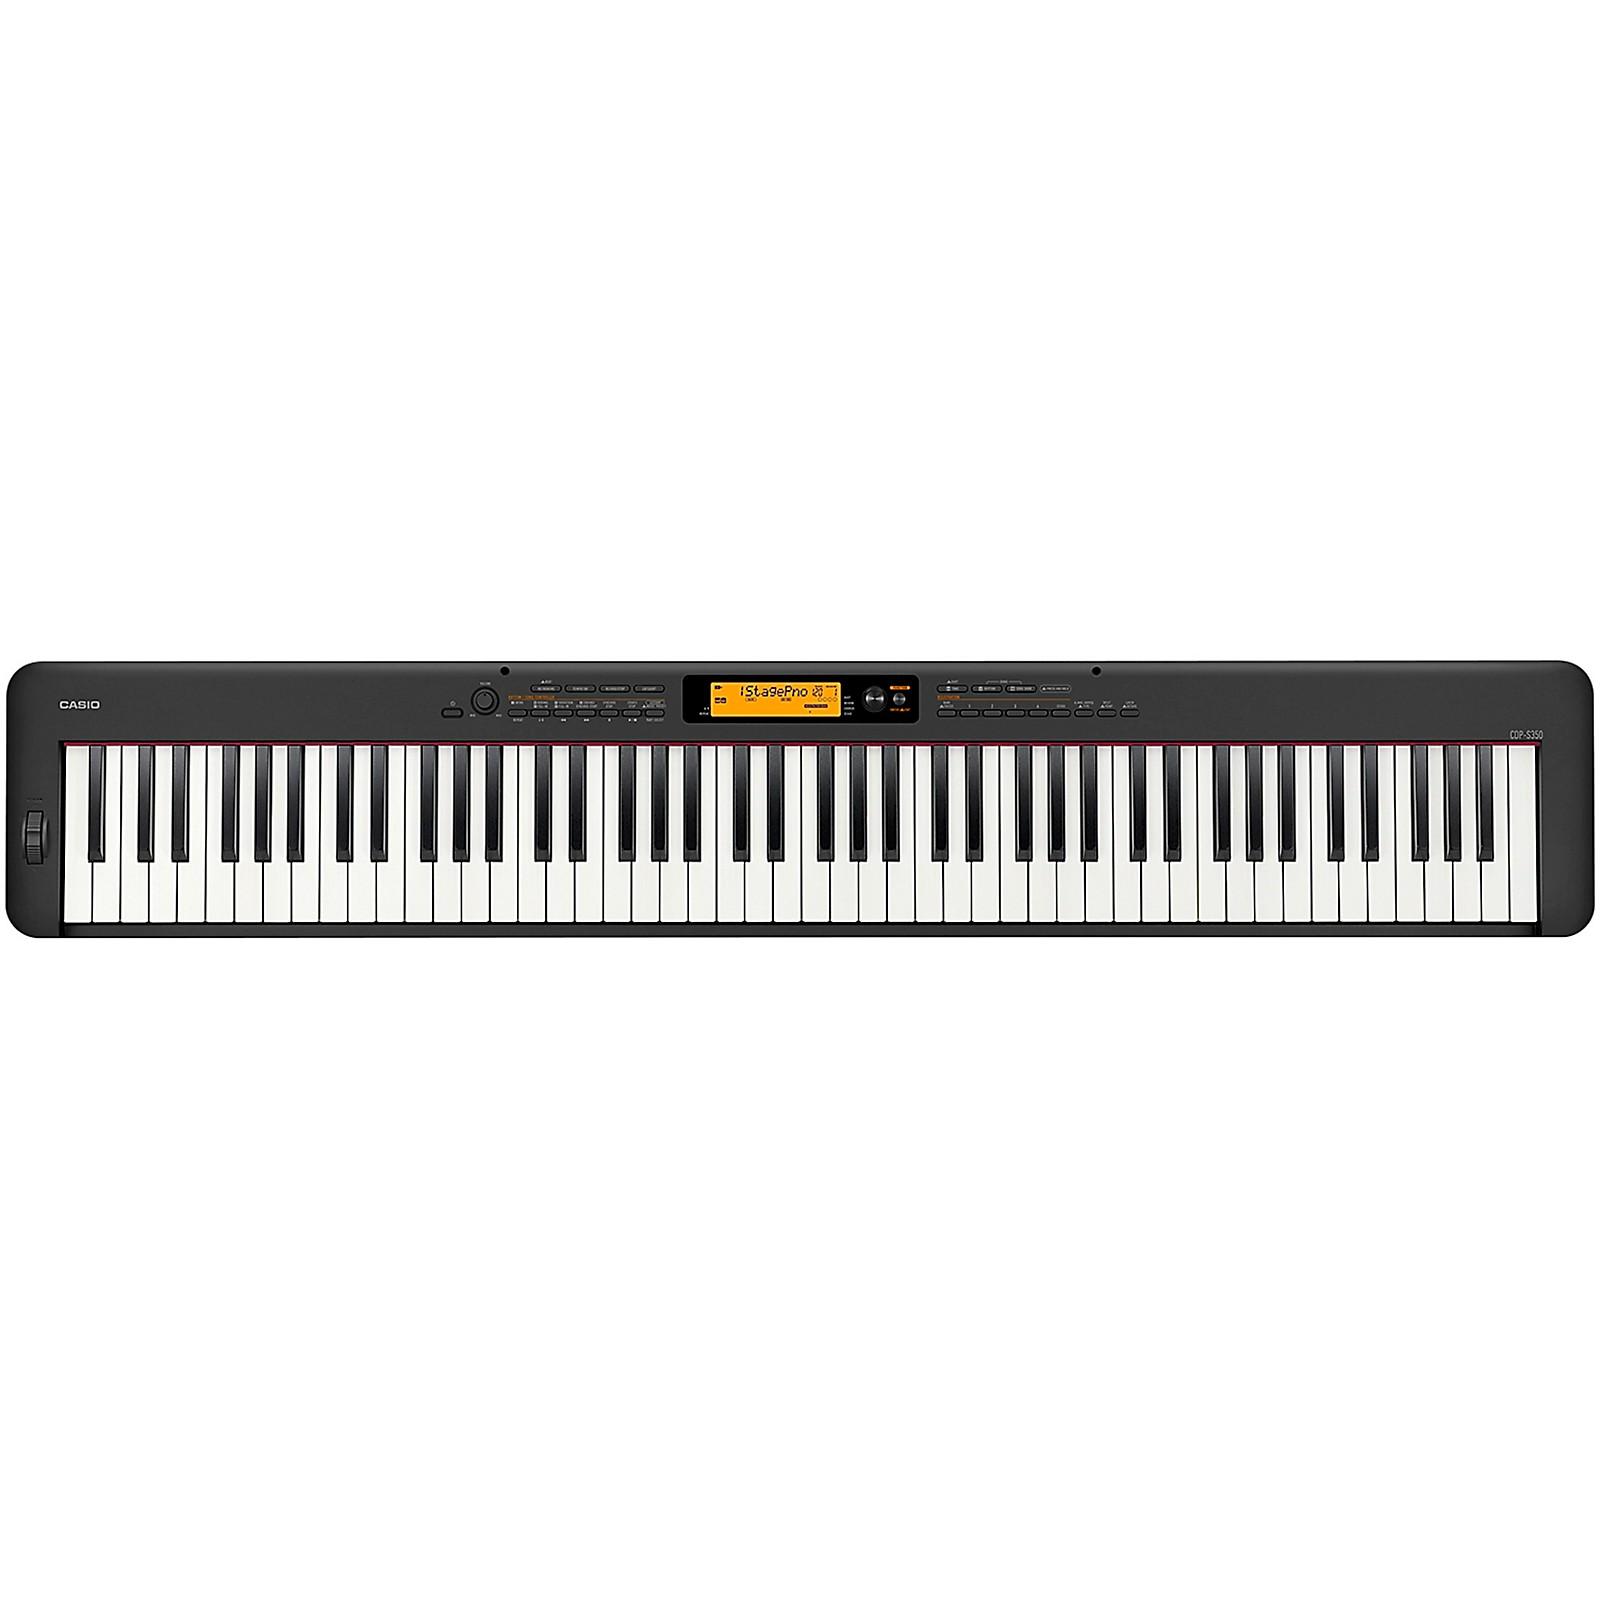 Casio CDP-S350 Compact Digital Piano